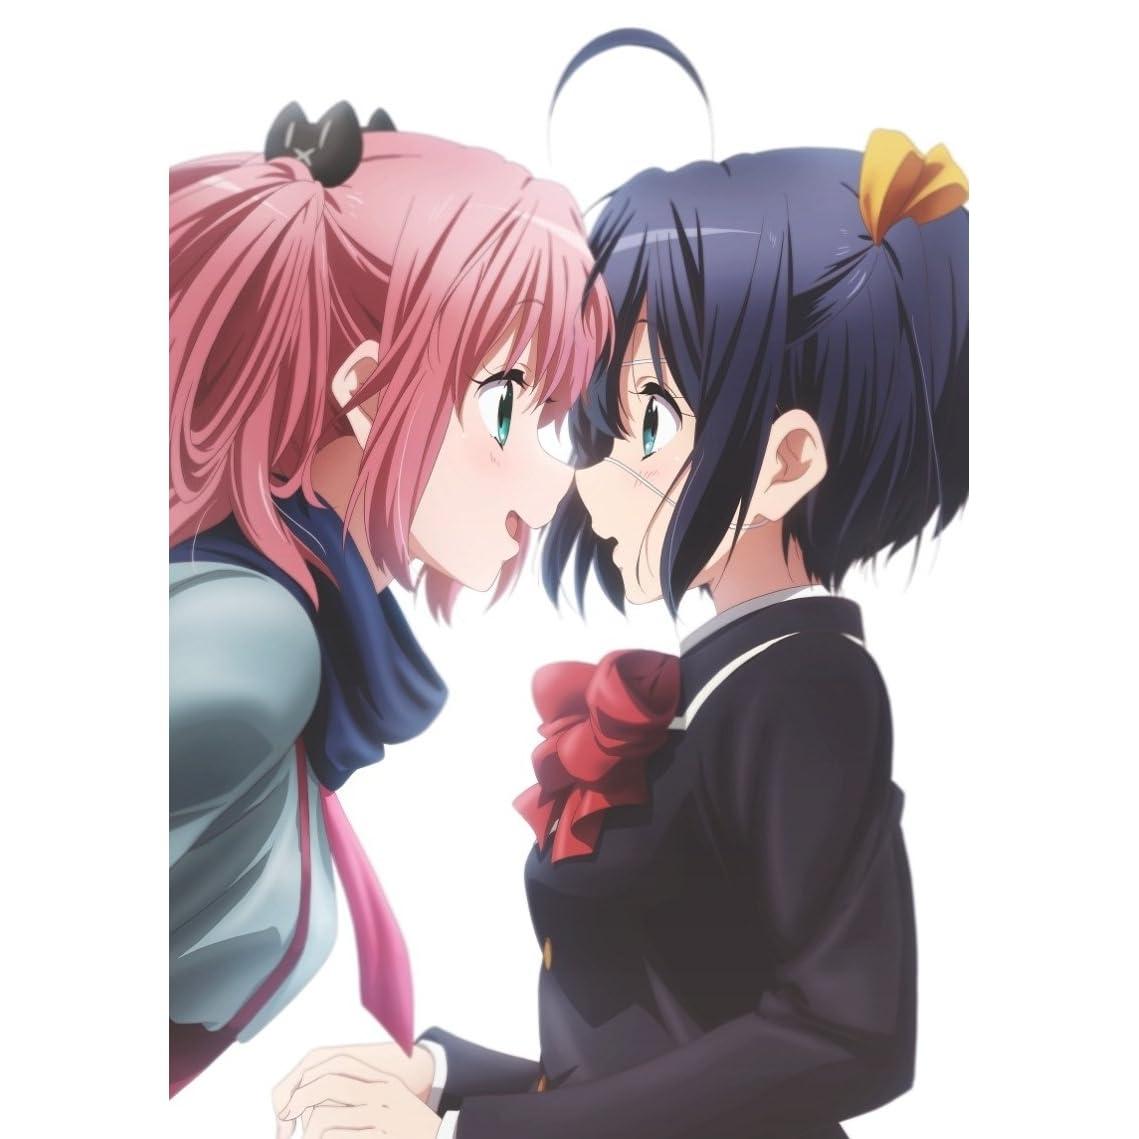 【Amazon.co.jp限定】中二病でも恋がしたい! 戀 (1) (初回限定版)(オリジナルブックカバー付き)[Blu-ray]